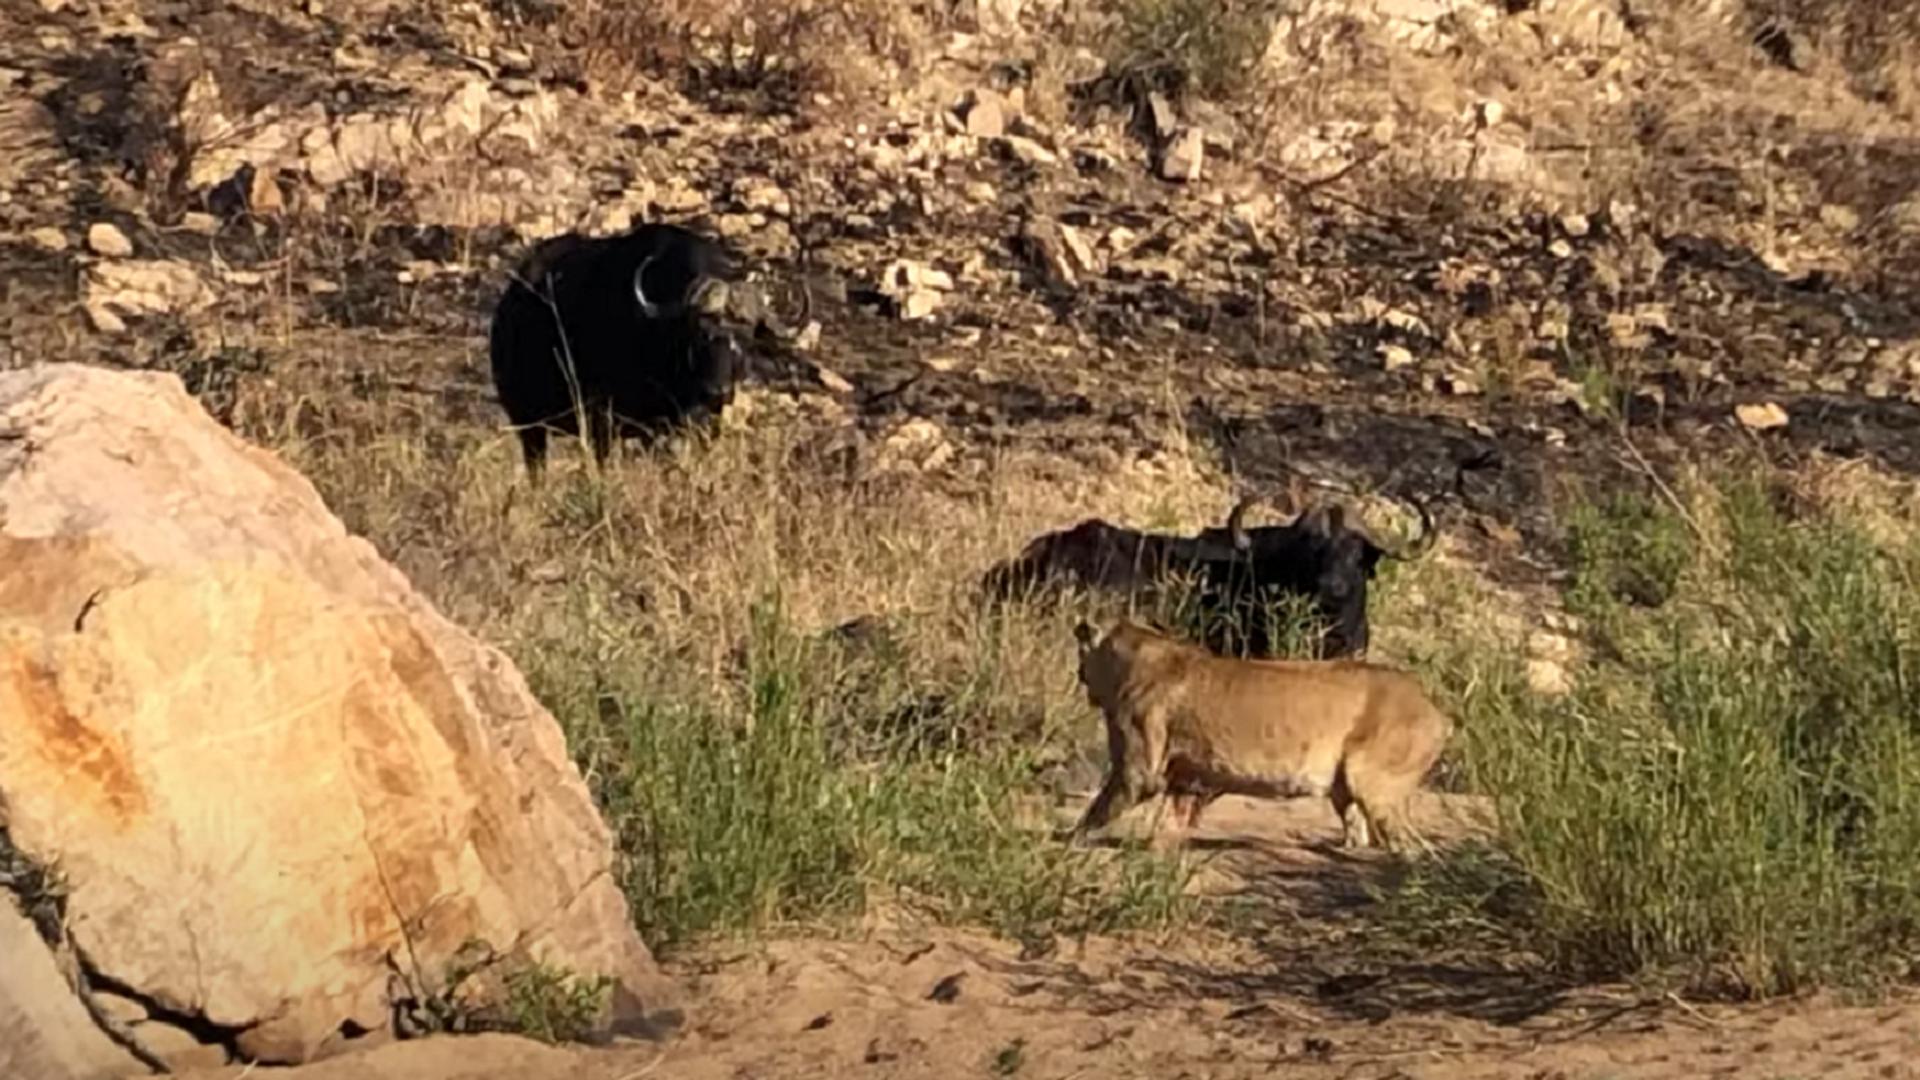 Unos leones se comen a un búfalo que pedía auxilio - Sputnik Mundo, 1920, 17.07.2021